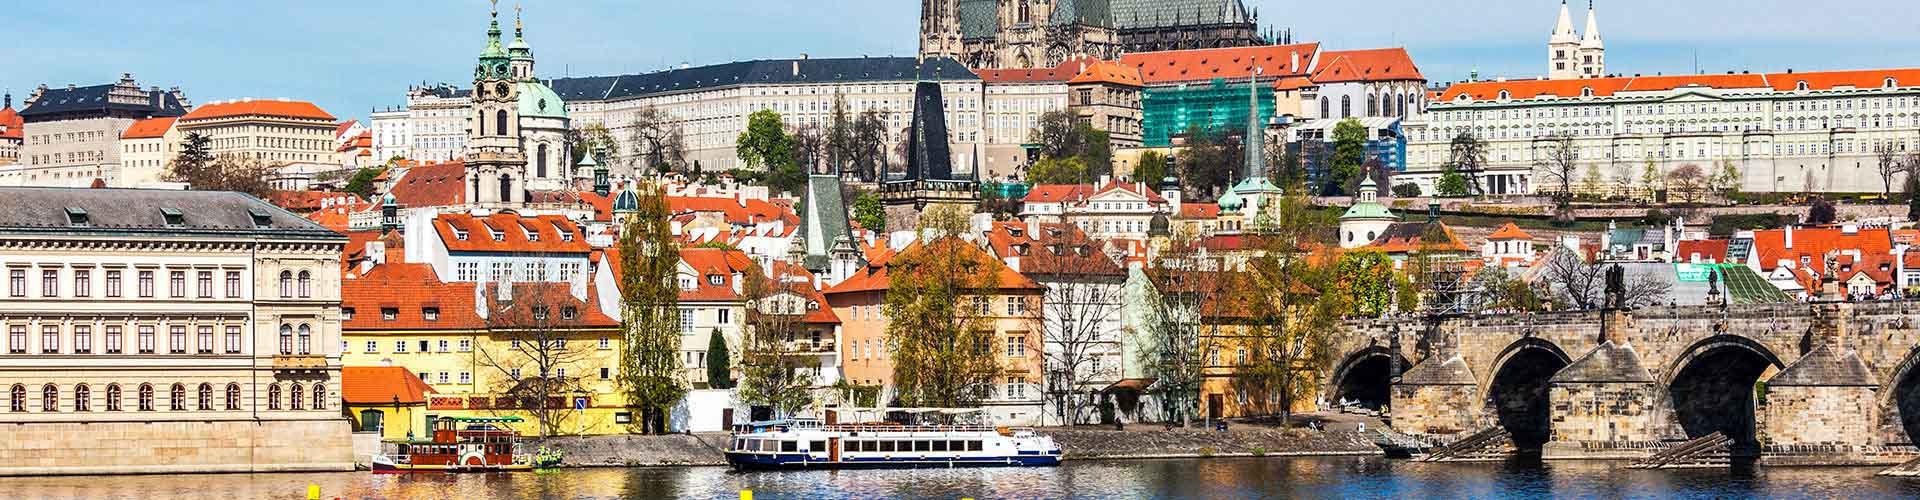 Praga - Apartamentos cerca a Catedral de San Vito. Mapas de Praga, Fotos y comentarios de cada Apartamento en Praga.